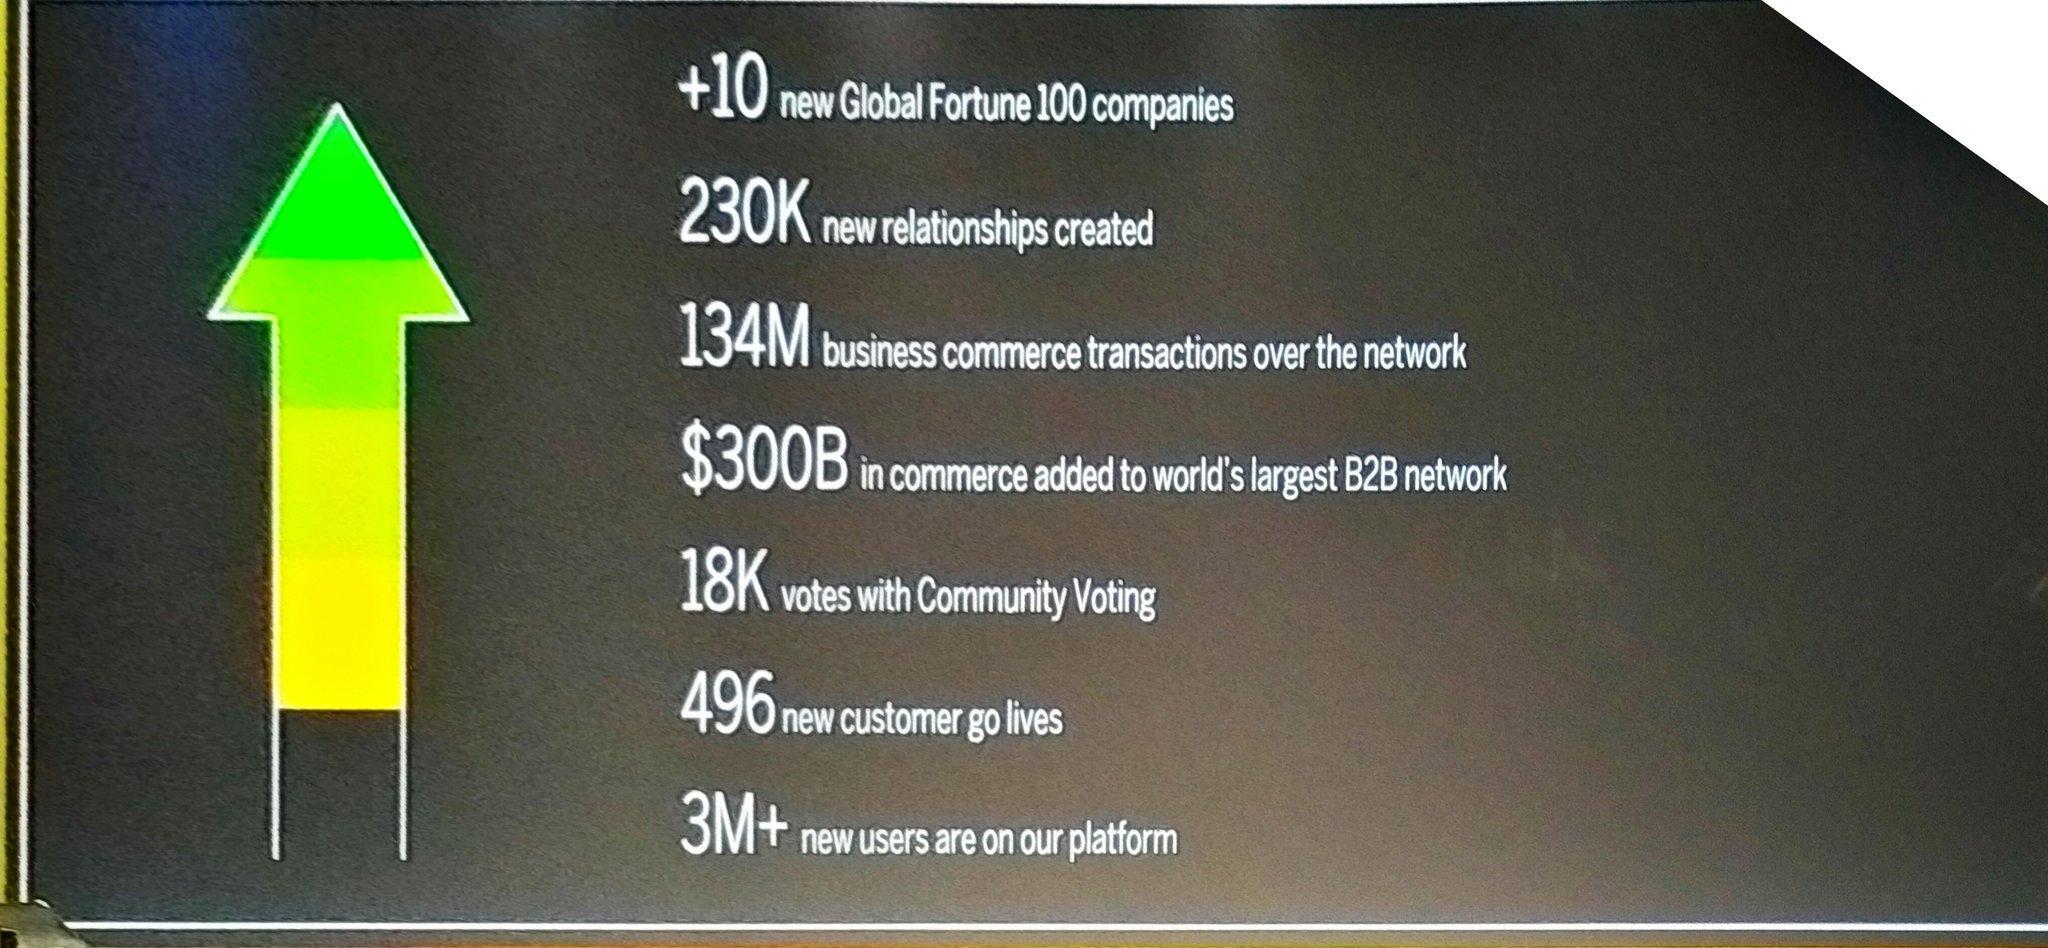 .@SAPAriba progress shared by @aatzberger  +10 Global100 customers 300B added in commerce  496 new customer to lives  #SAPARIBALIVE https://t.co/L2FK0CAlrv